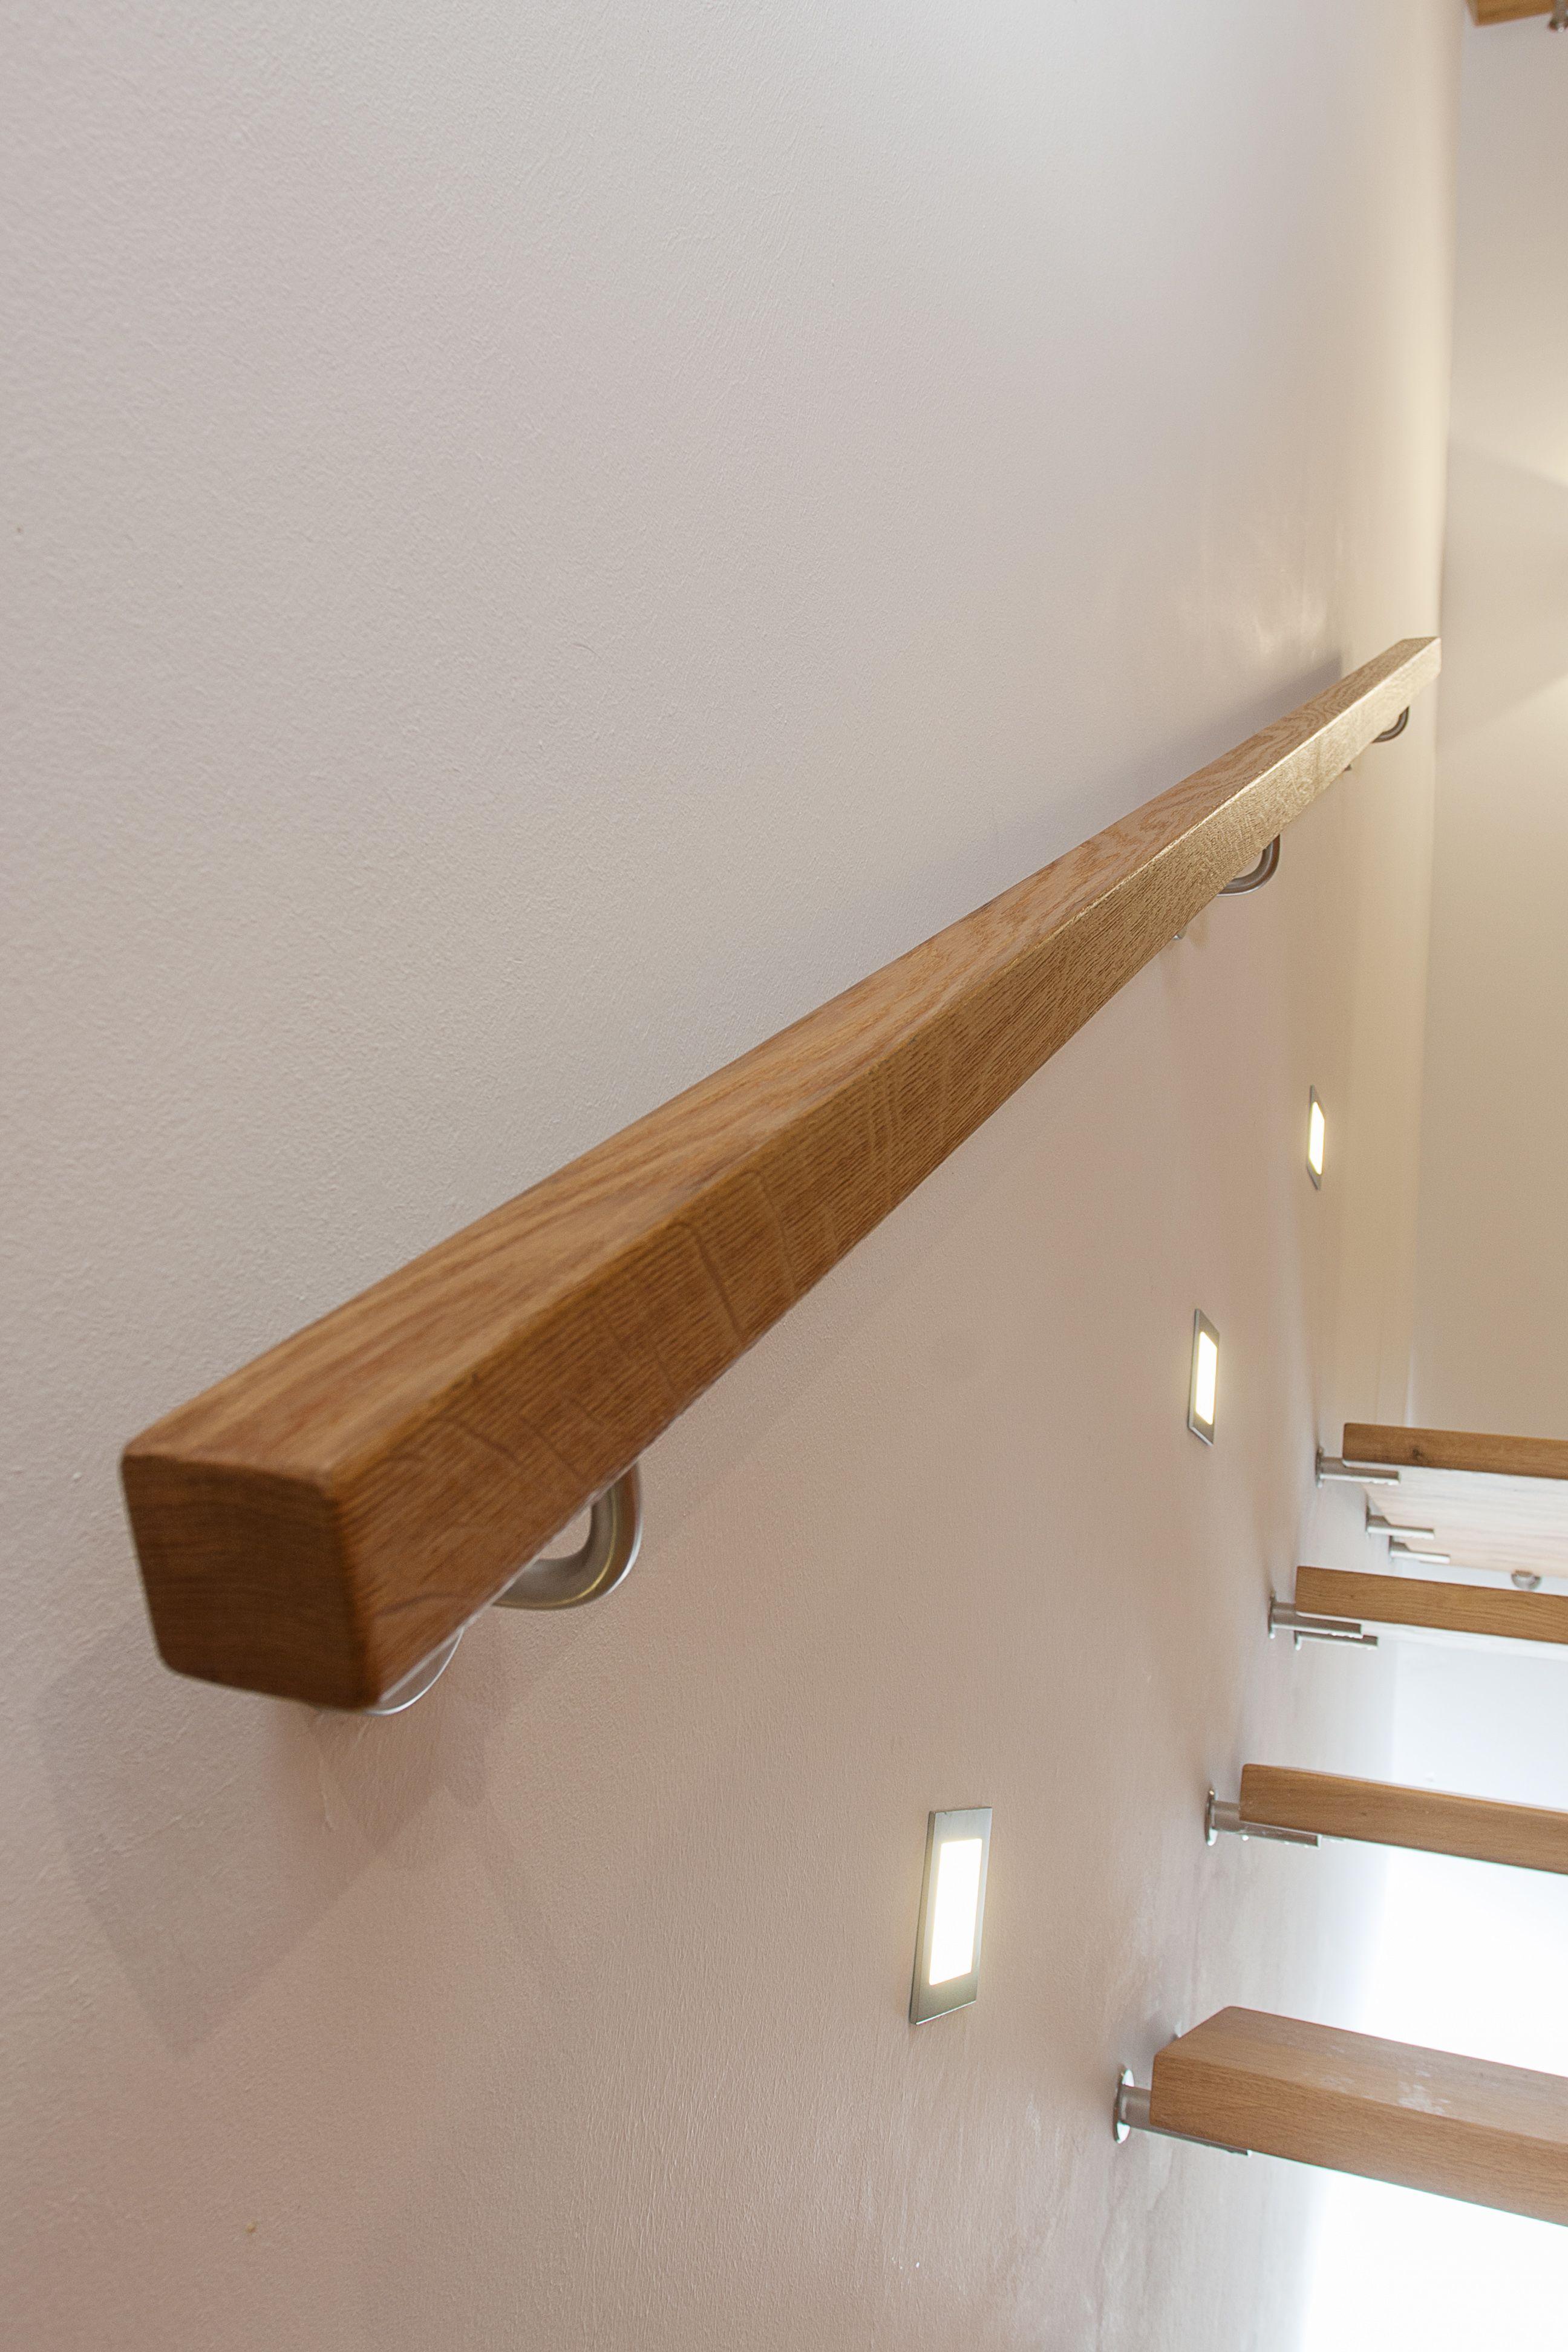 Frey Wandhandlauf Holz Beleuchtung Edelstahl Holzhandlauf Handlauf Treppe Handlauf Holz